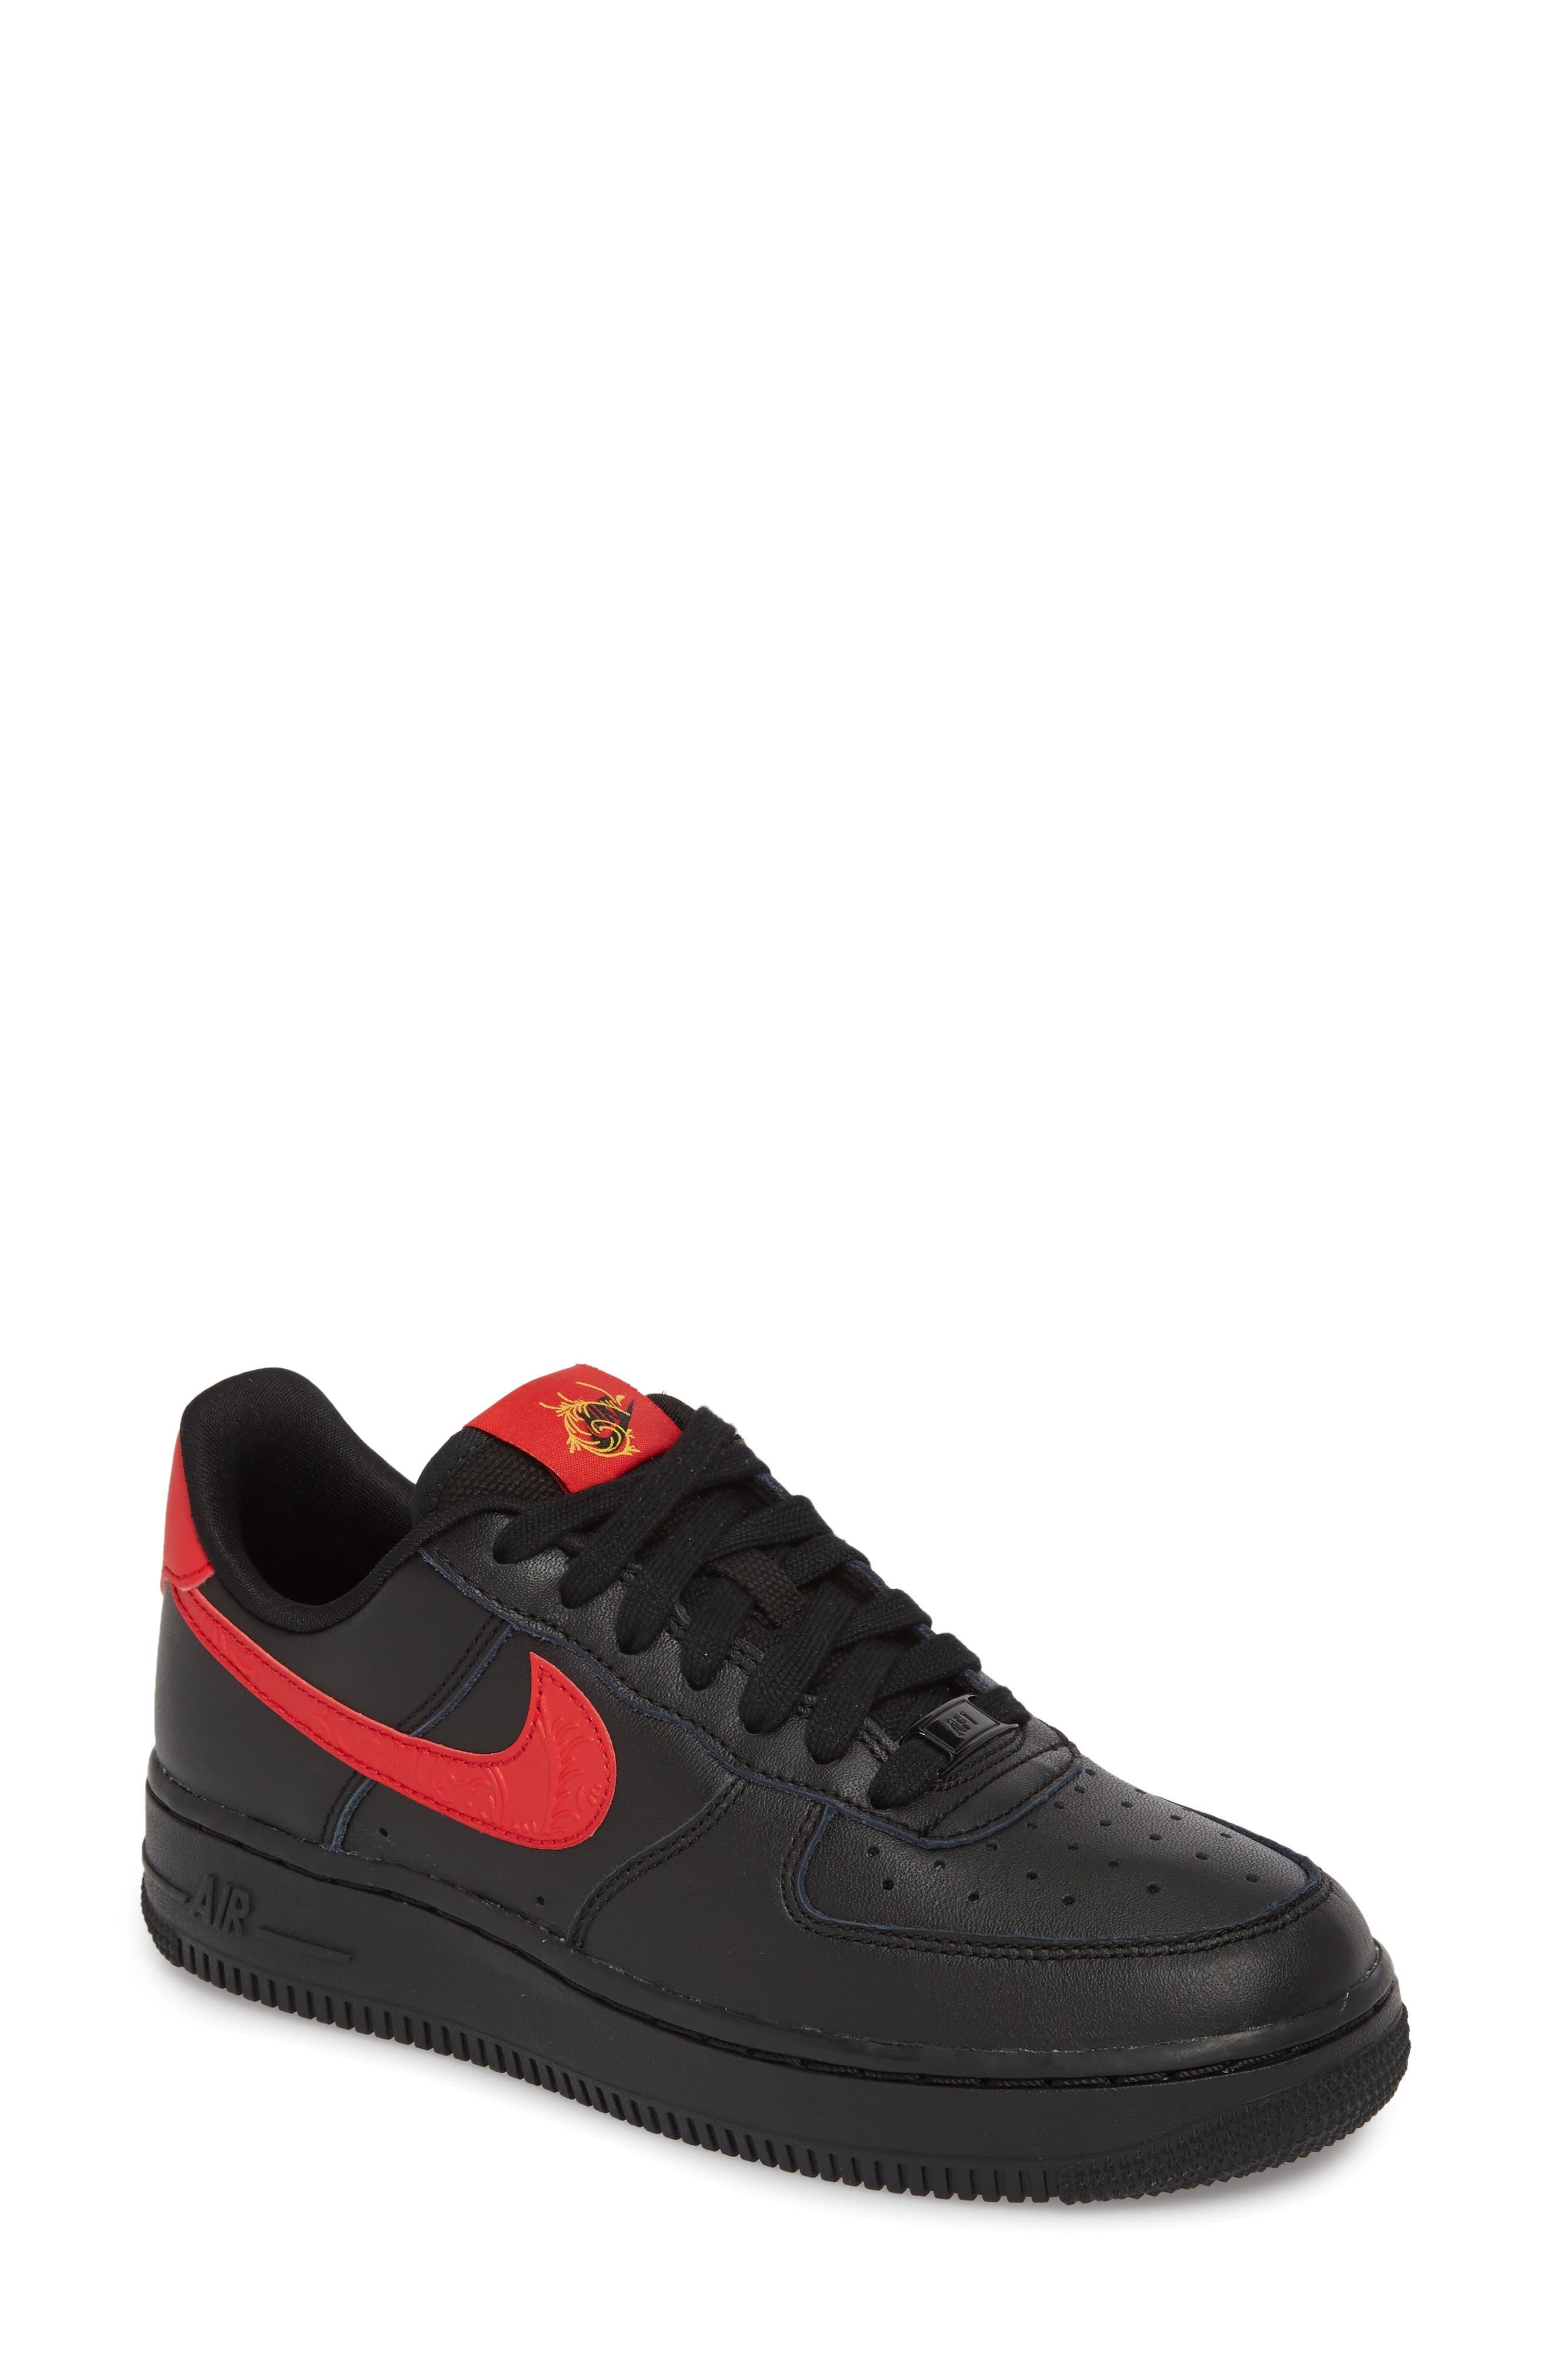 Air Force 1 '07 Sneaker,                         Main,                         color, Black/ University Red